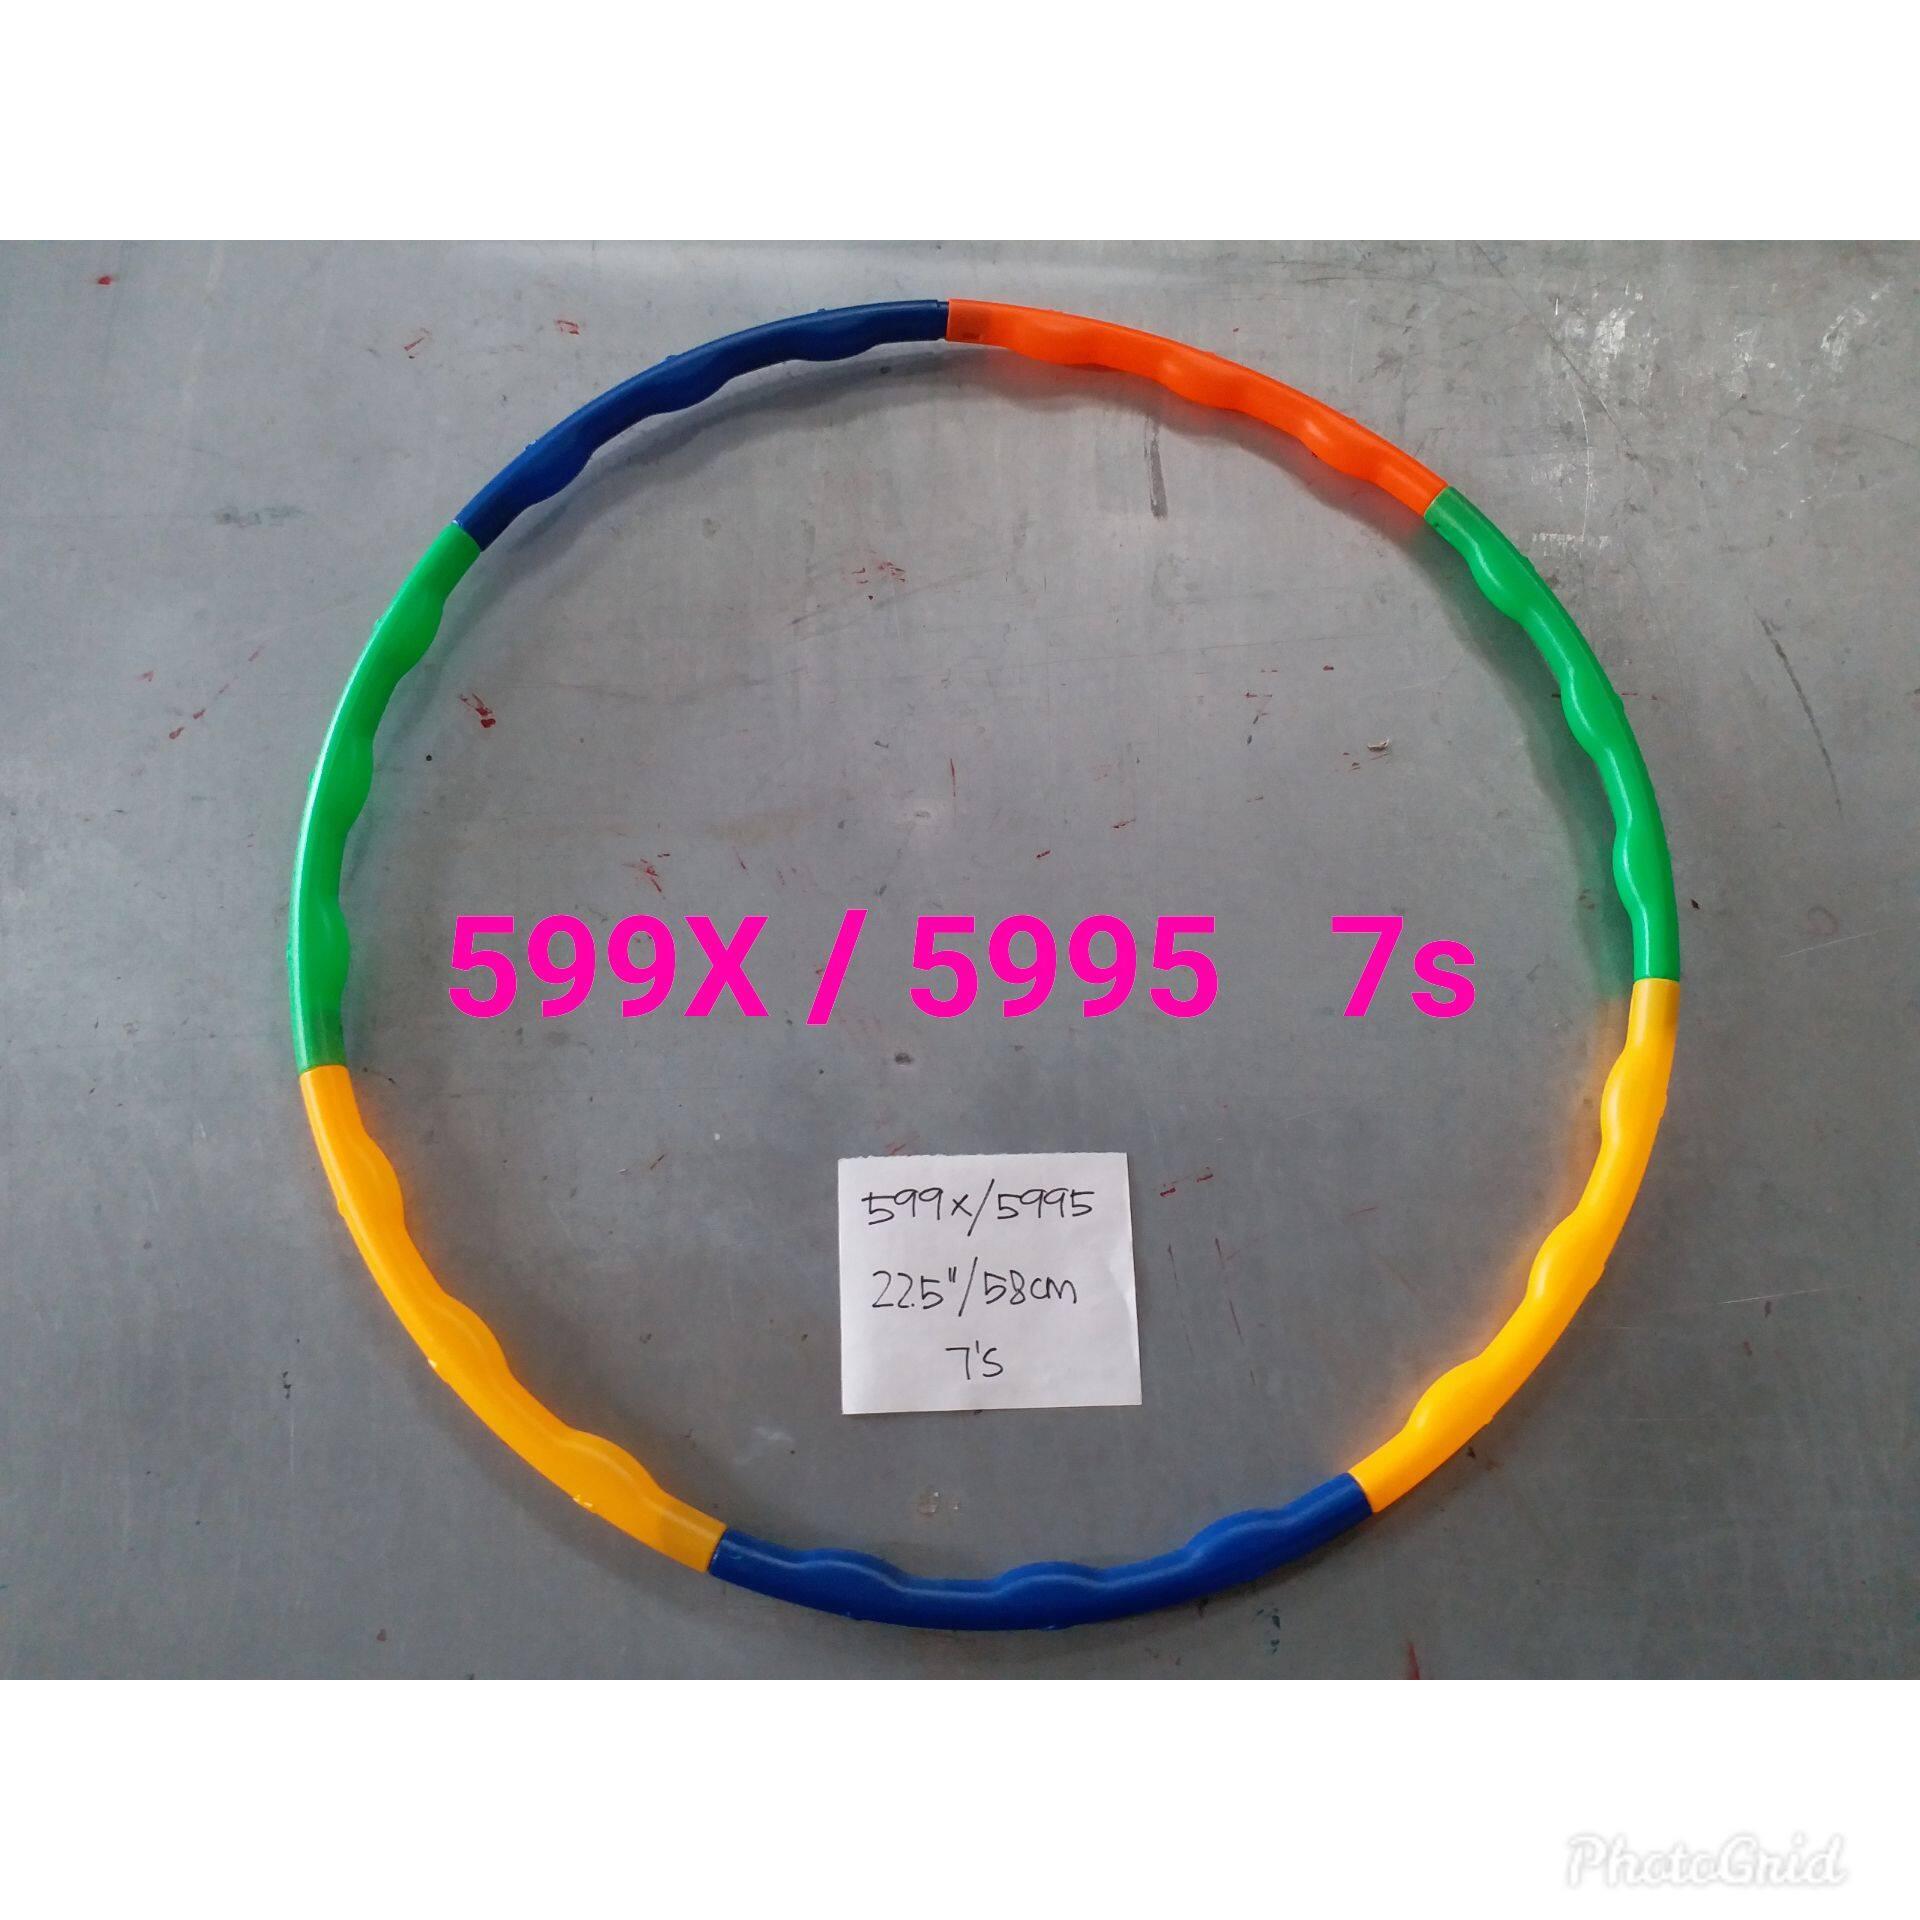 599X/5995 7s HOOLAY HOPE (Rejoinable) x 2sets